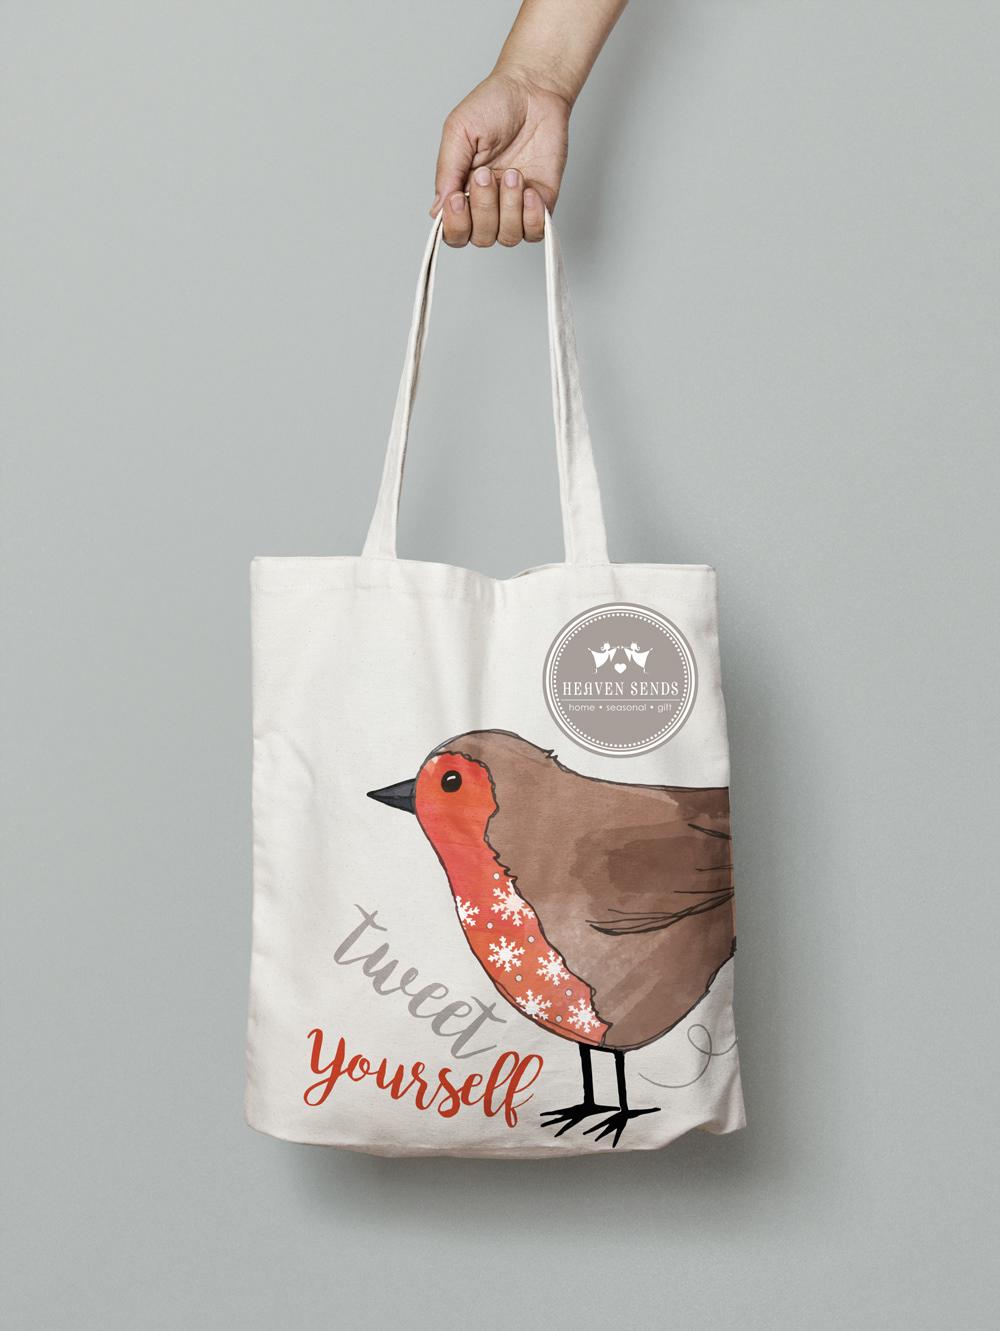 giftware totebag canvasbag homedecor marketing   marketingdesign birds watercolour digitalart vector